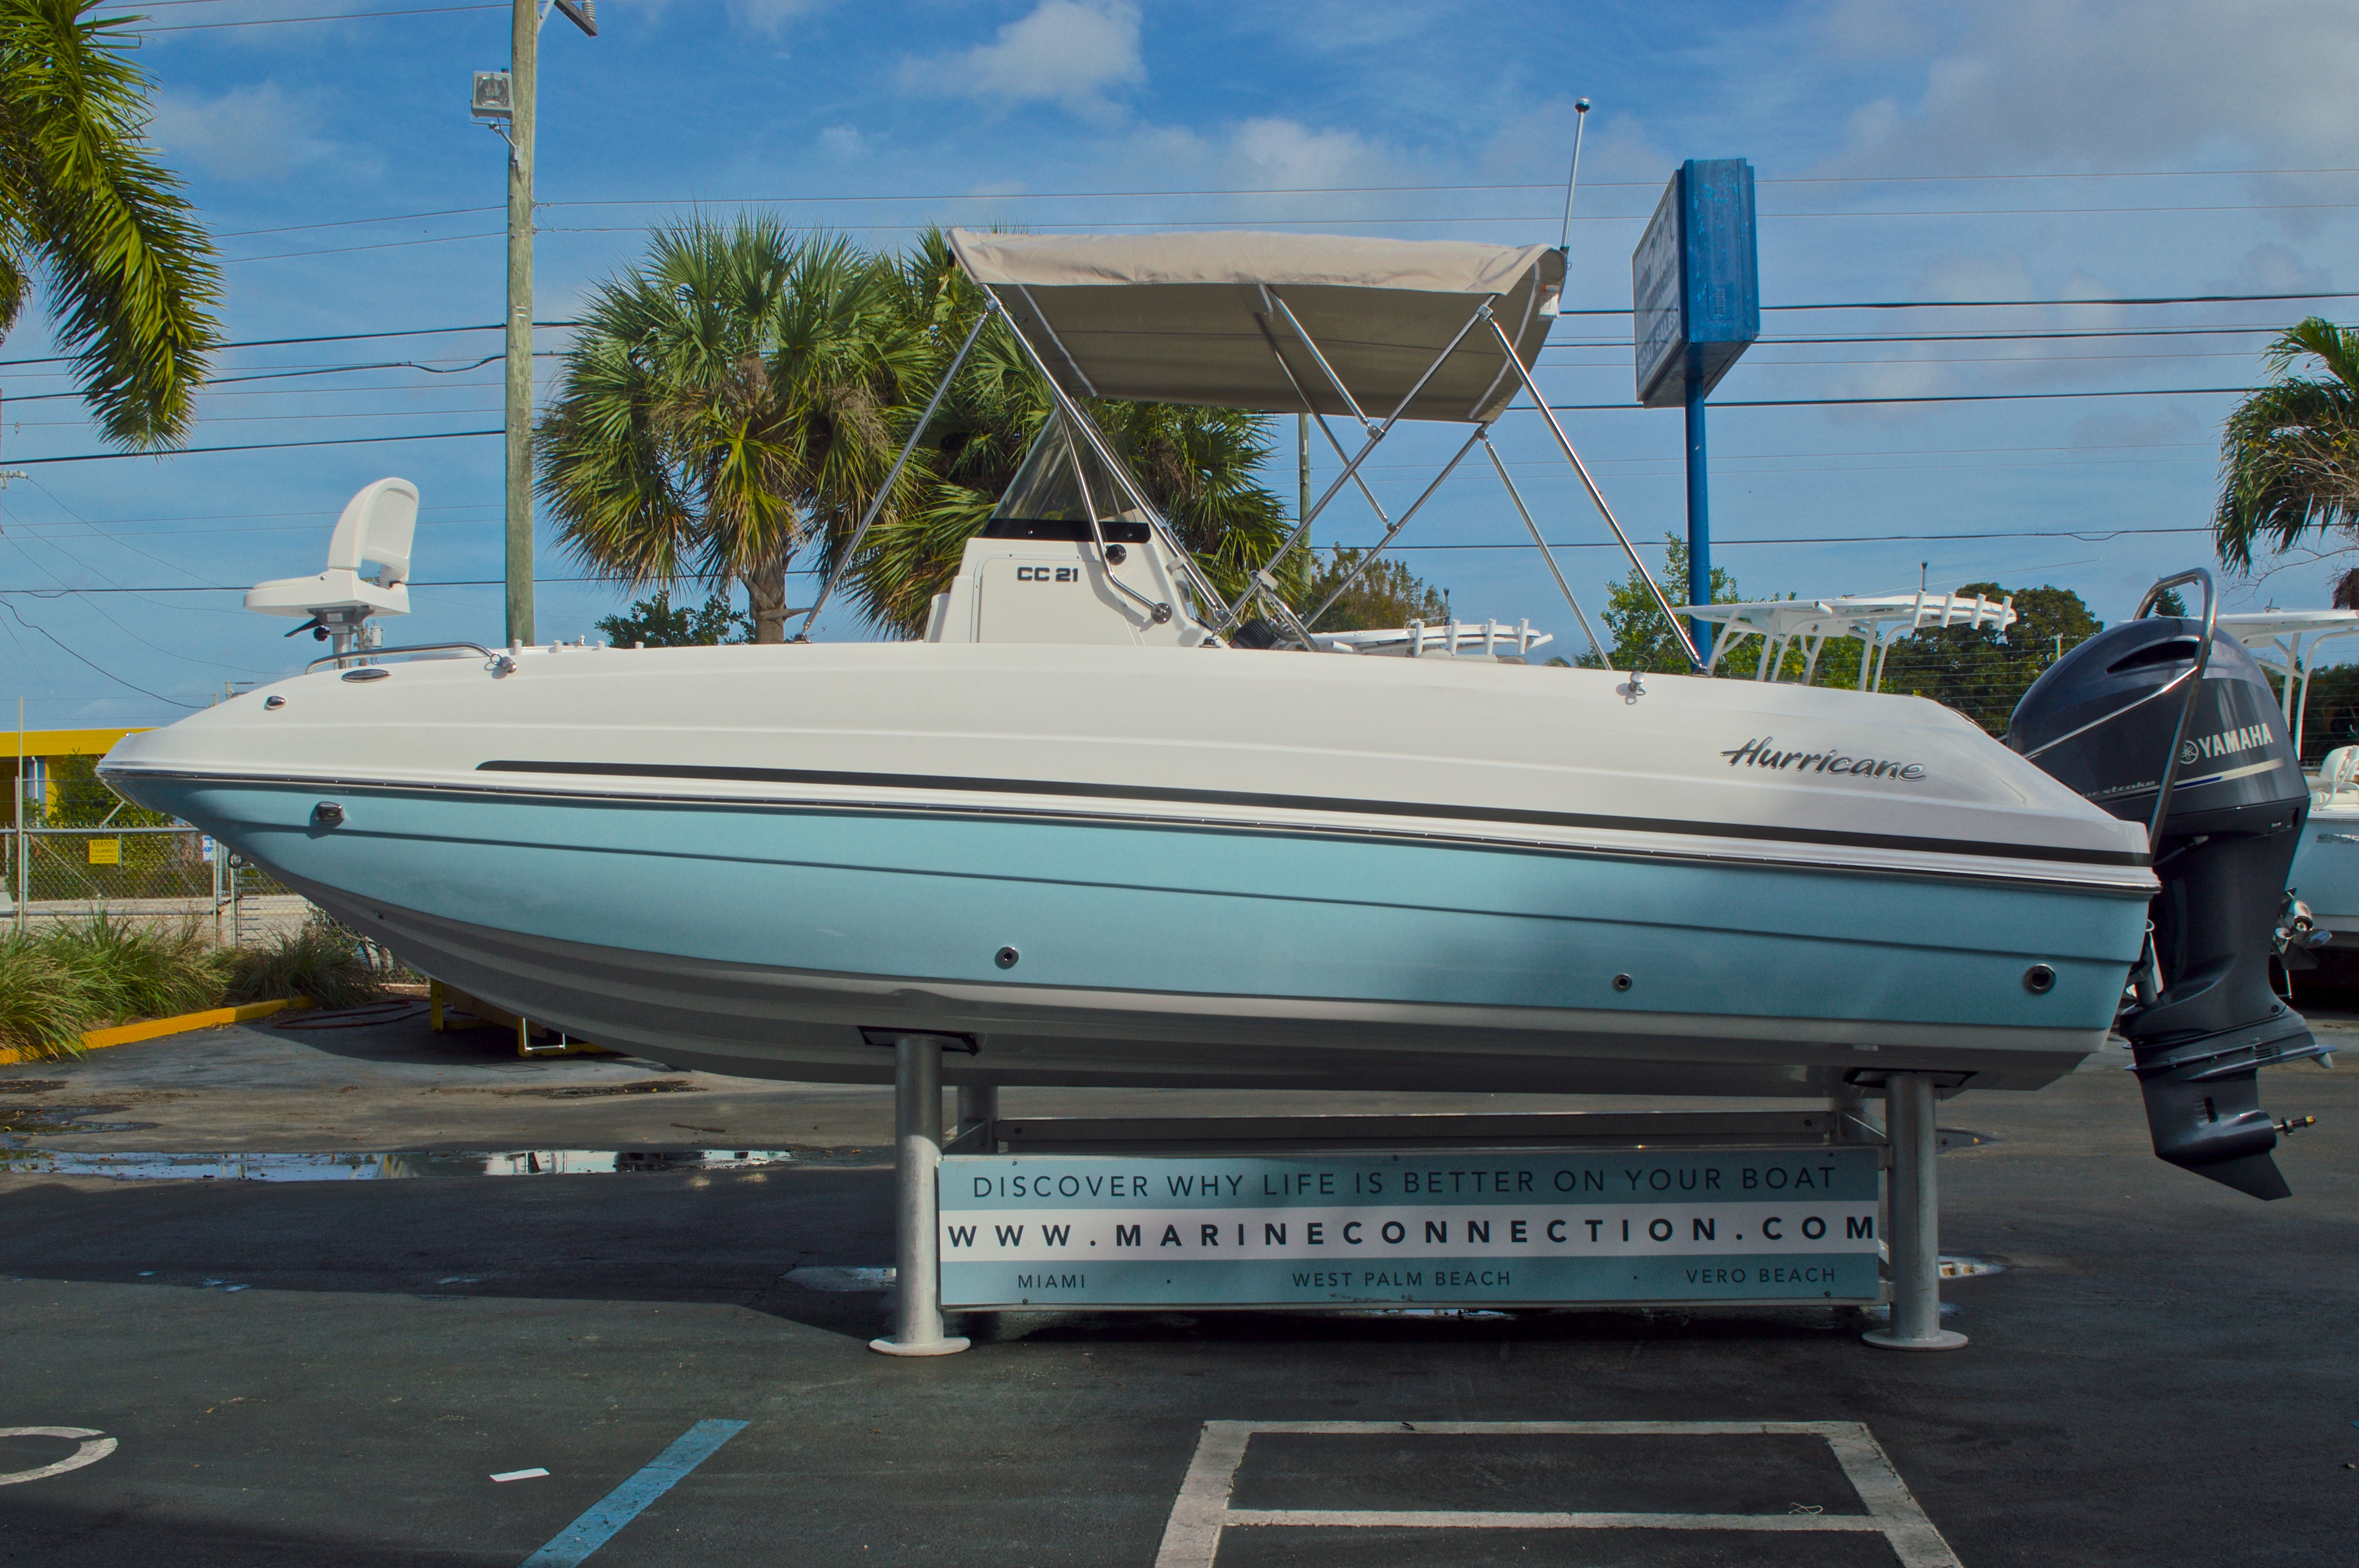 Thumbnail 6 for New 2016 Hurricane CC21 Center Console boat for sale in Vero Beach, FL